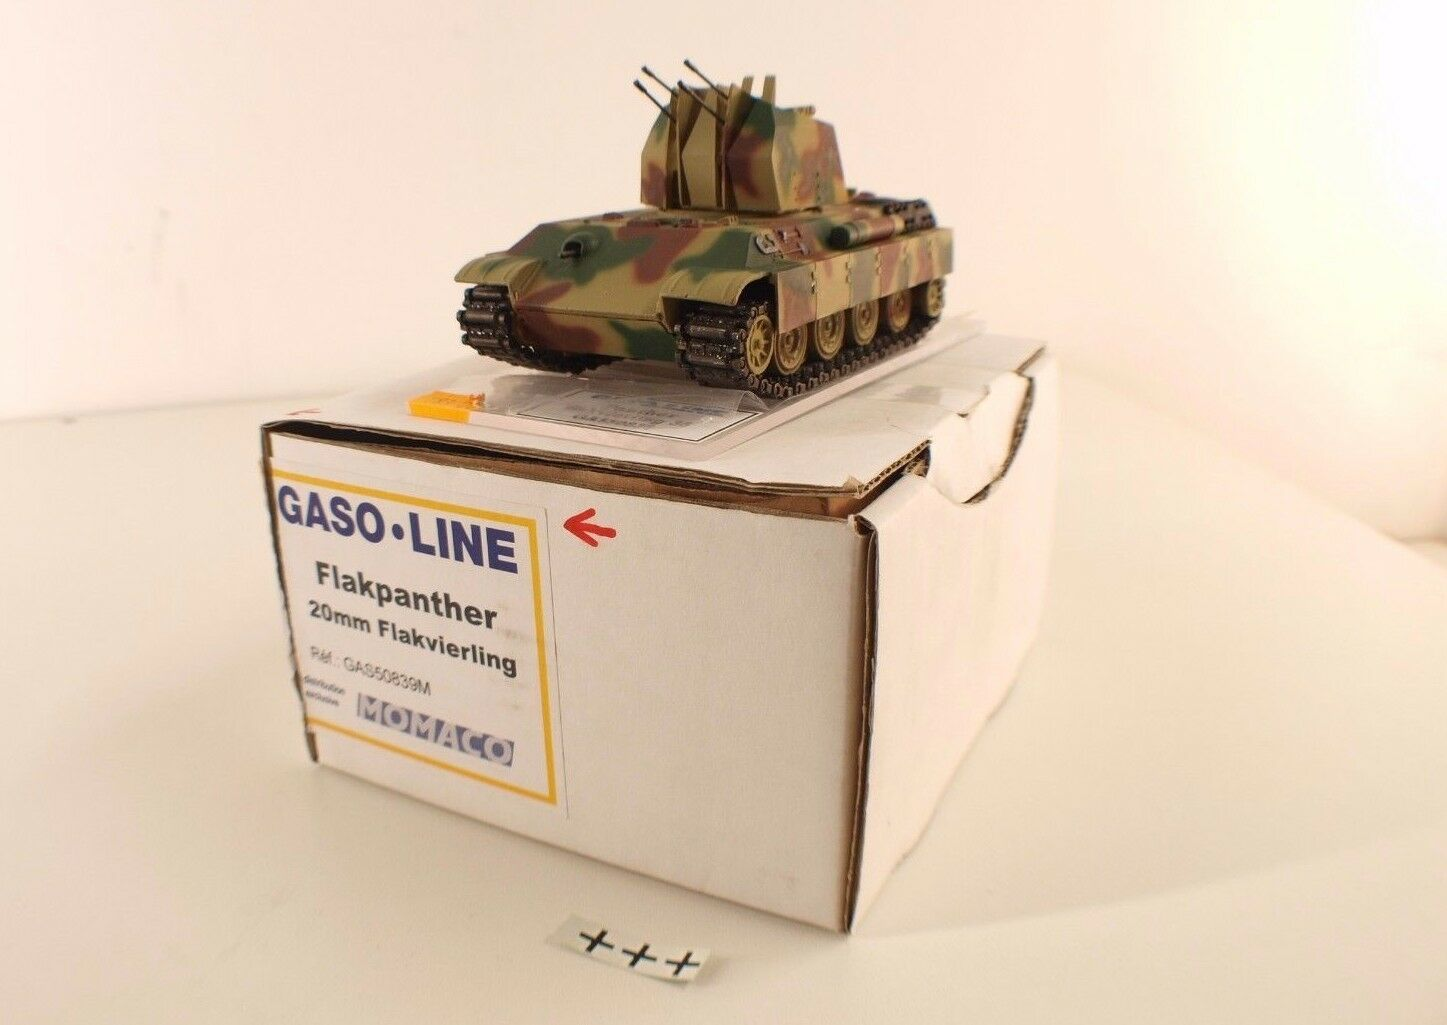 GASO.LINE GAS50839M Flakpanther 20 mm flakvierling 38 allemand neuf boite mint